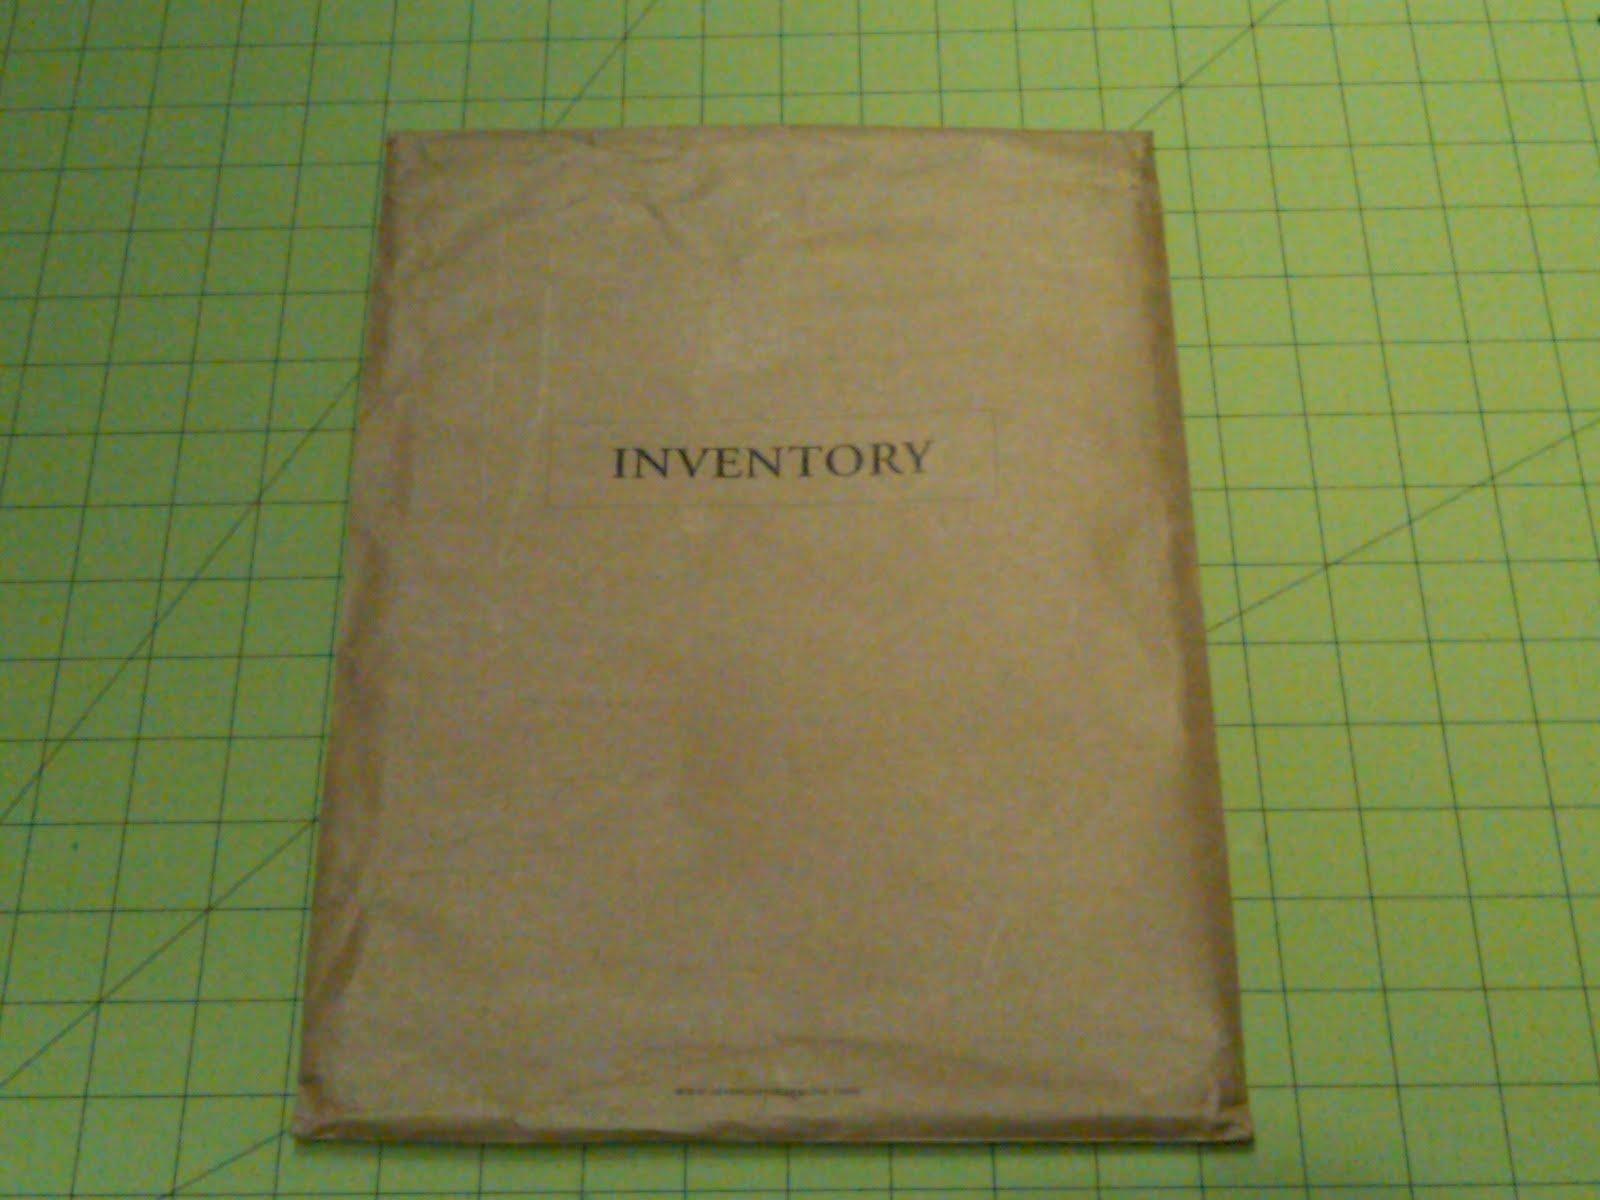 [Inventory+Envelope]